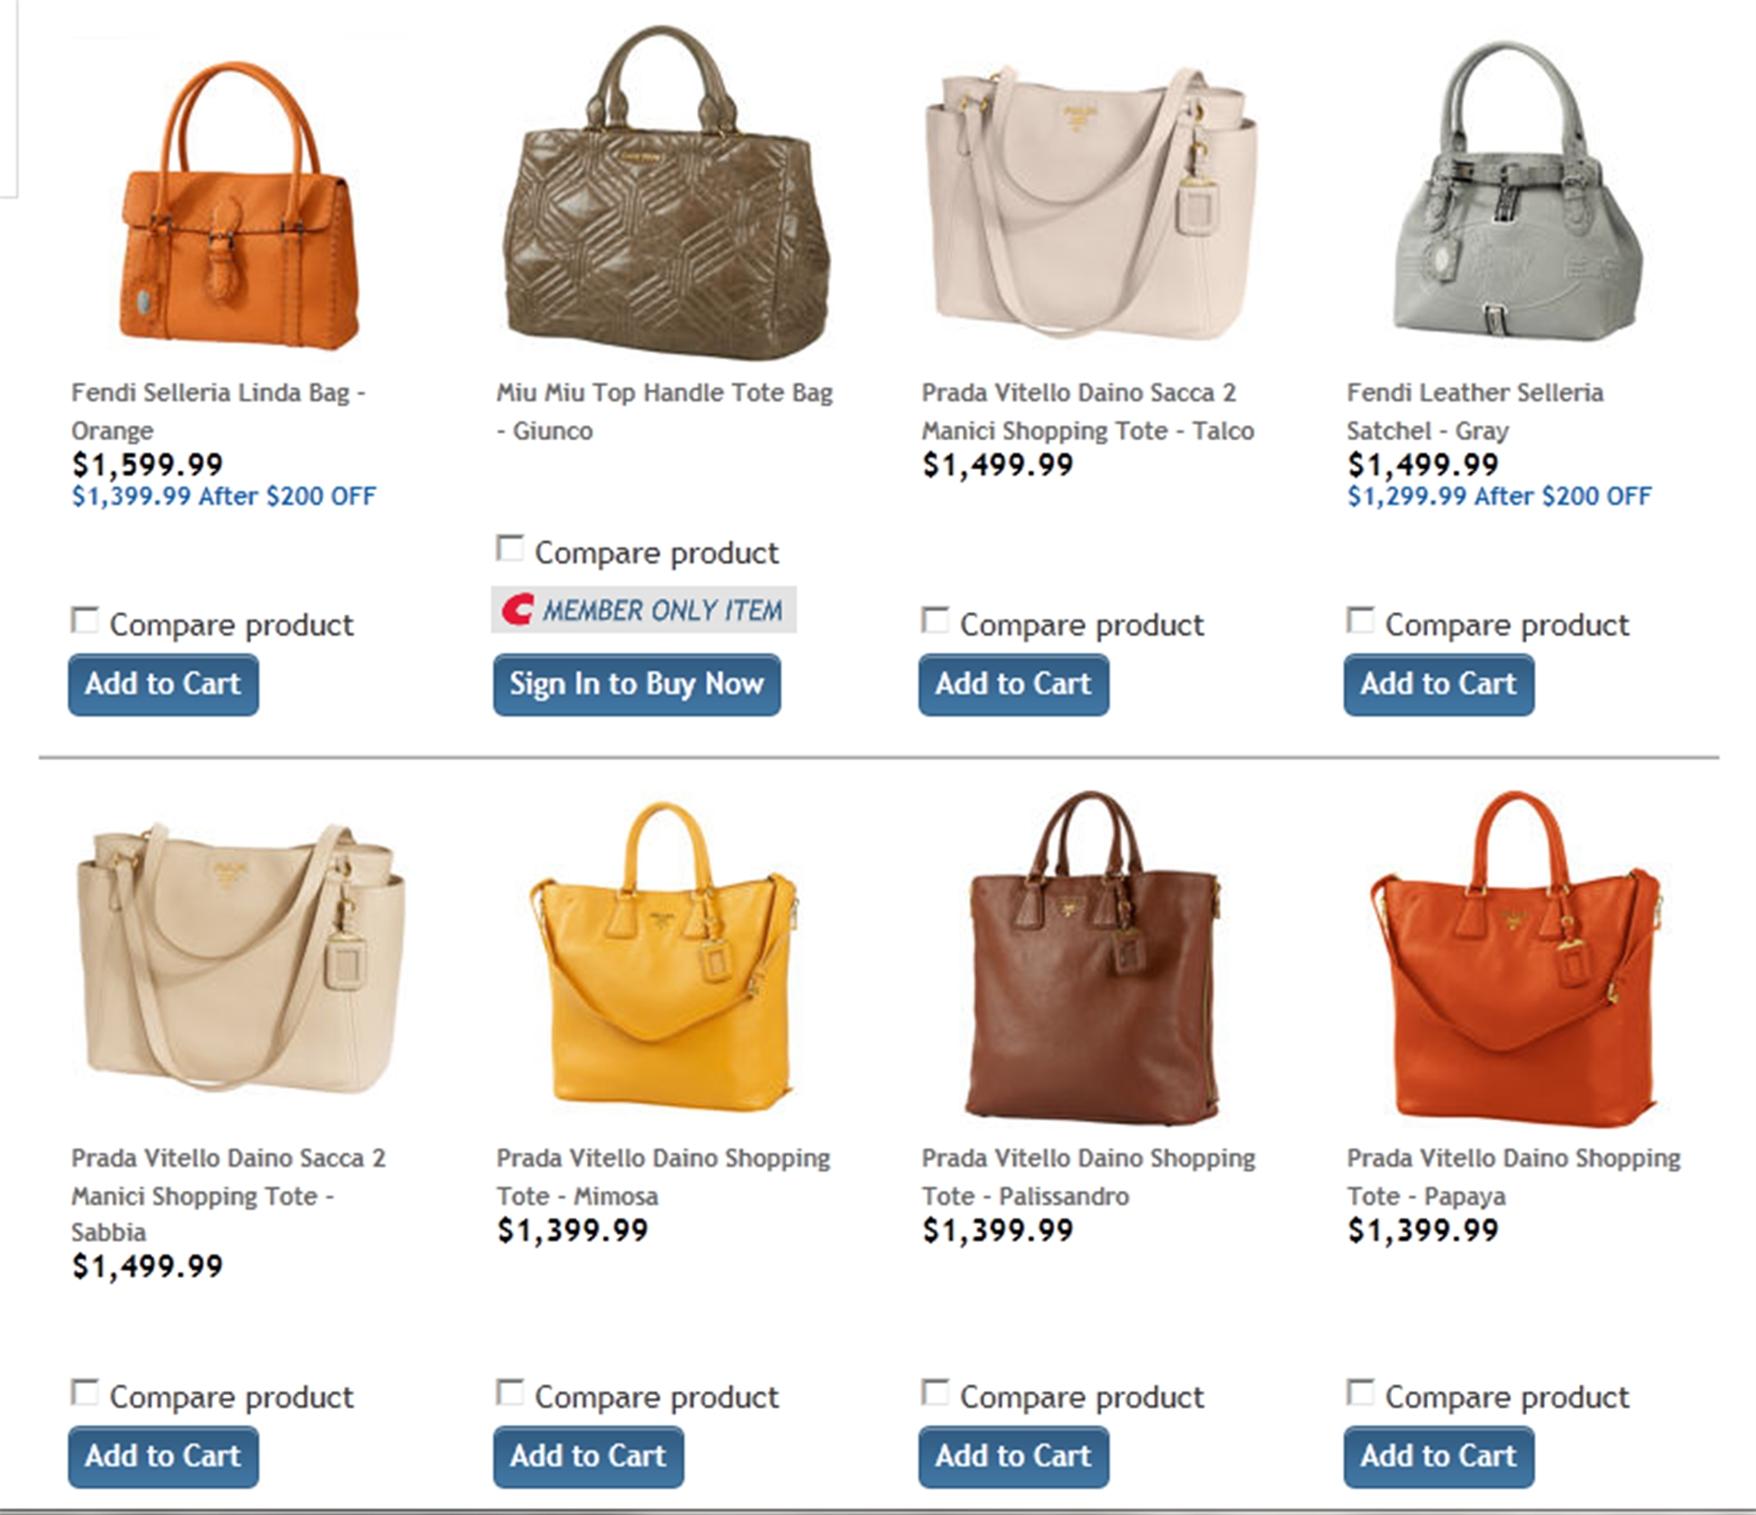 Hell and Back for a Handbag Patience Wins Elisas Ramblings